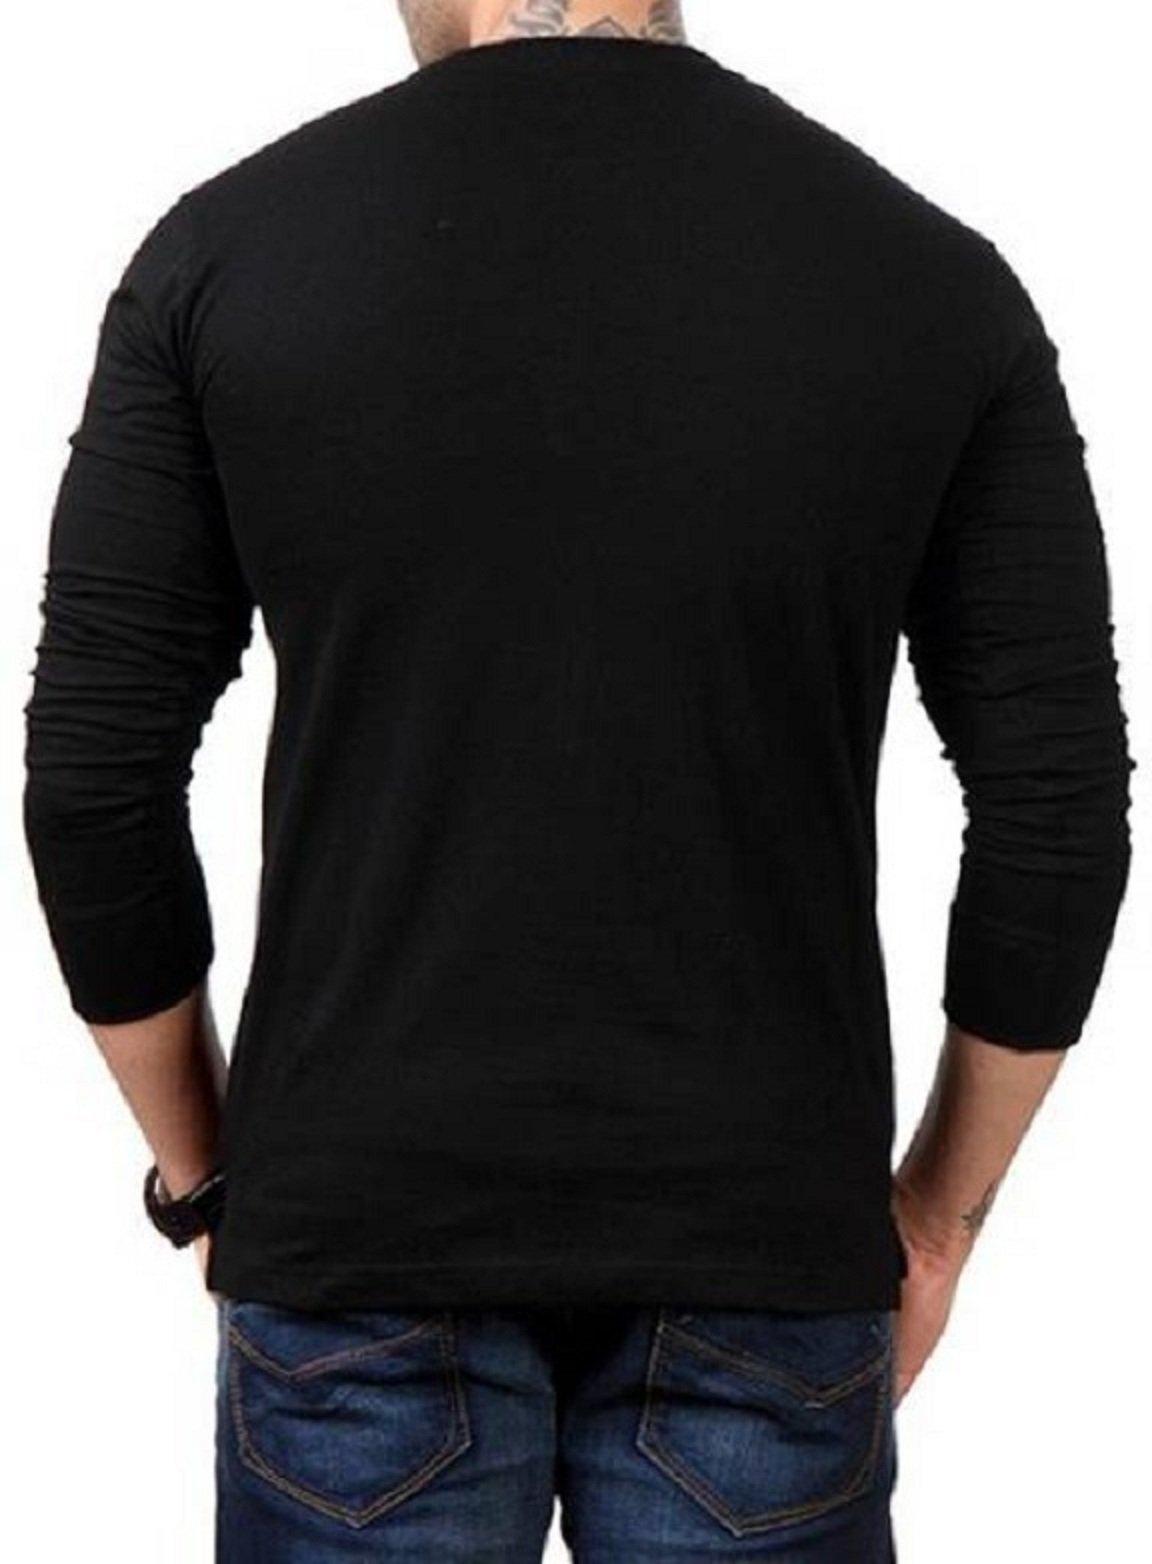 0cbc4d70277 Style Shell Men s Cotton Long Sleeve Top (Vnk)